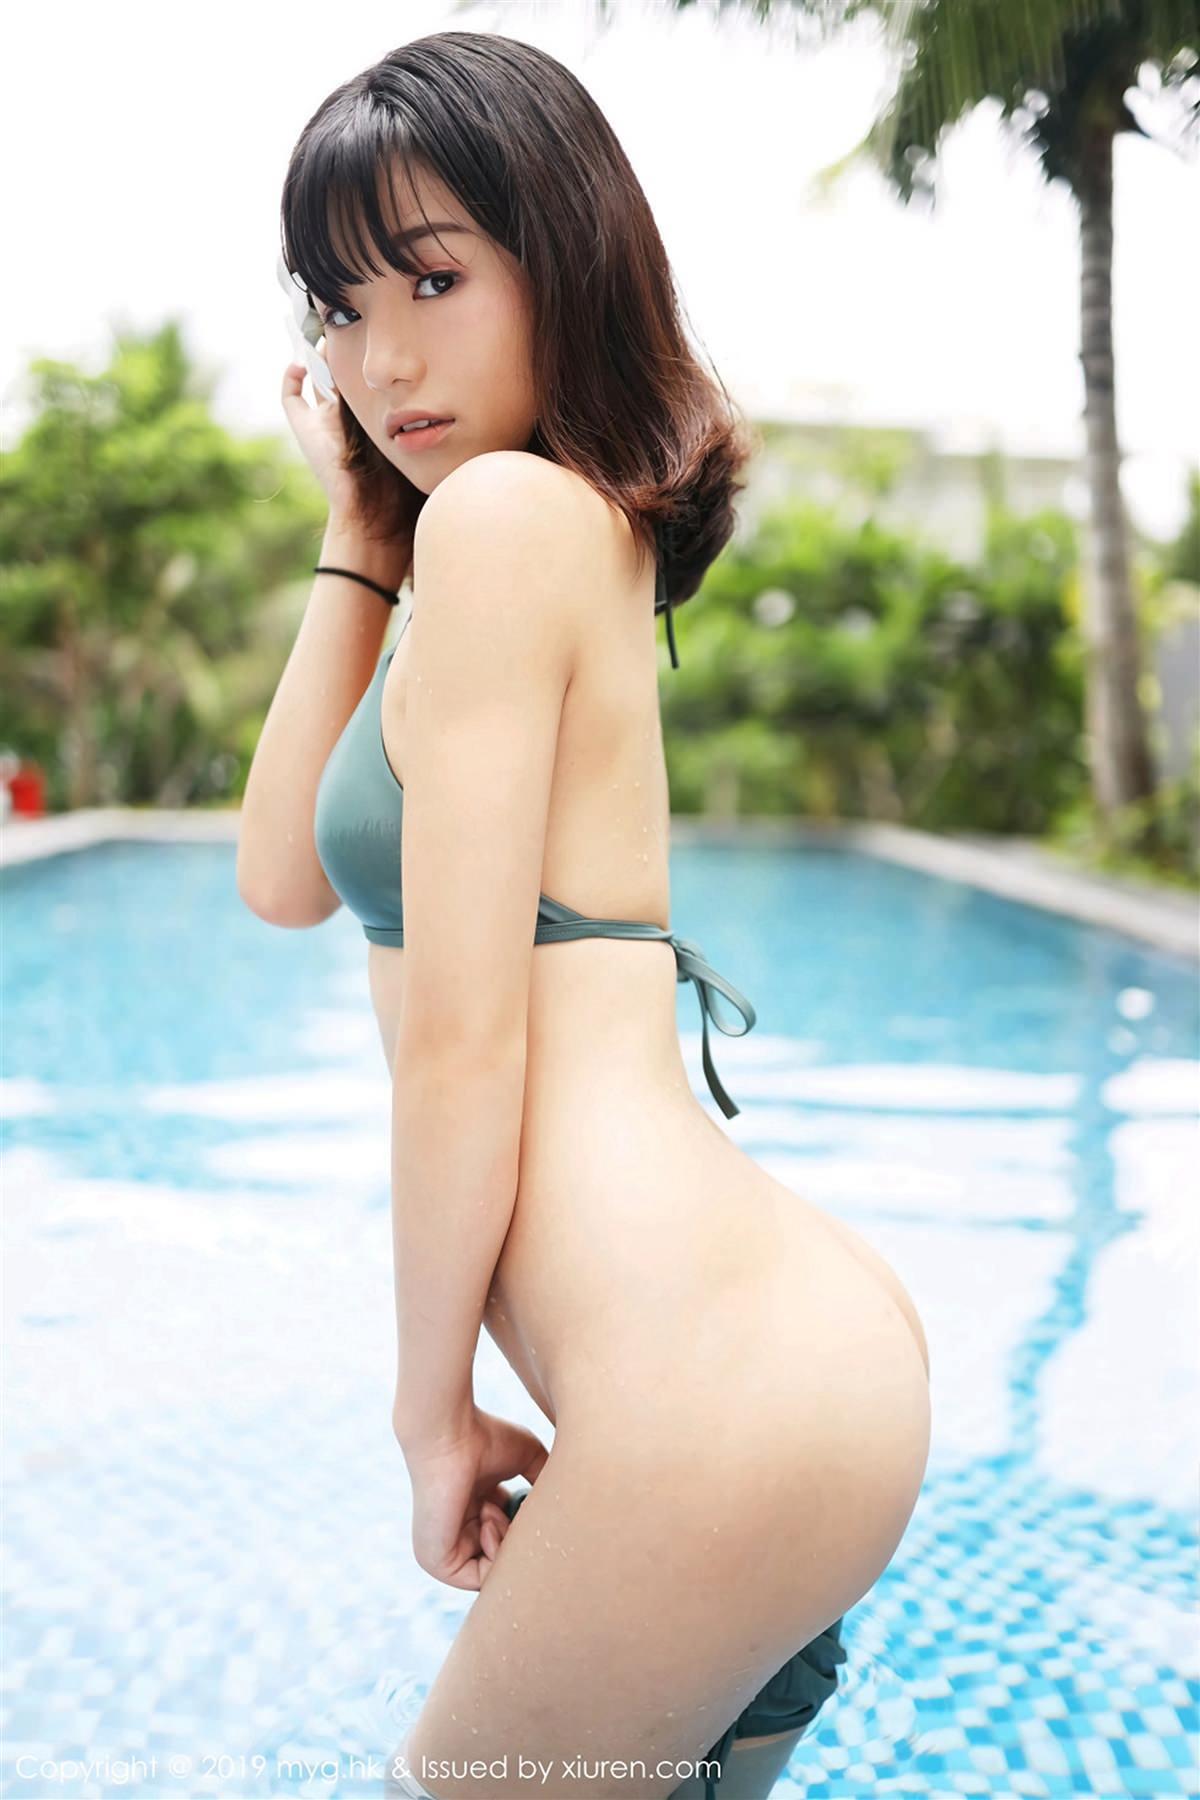 MyGirl Vol.362 28P, Cang Jing You Xiang, mygirl